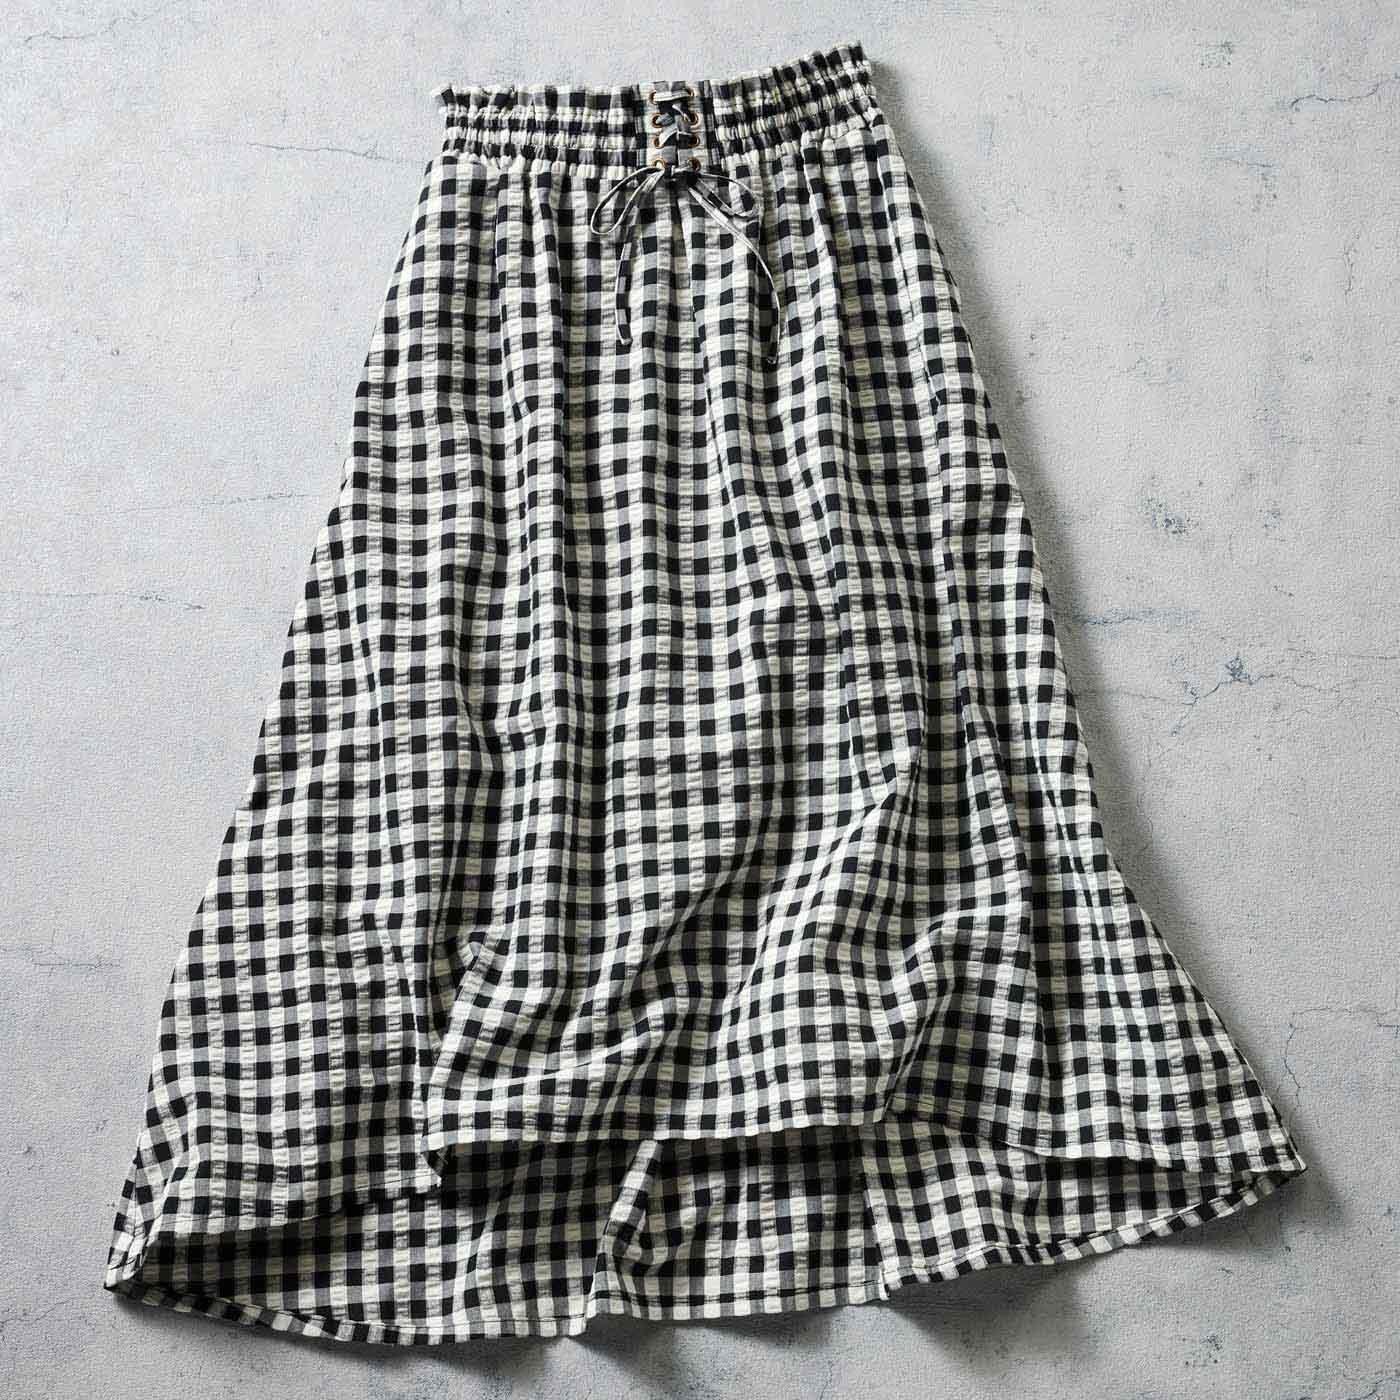 IEDIT[イディット] サッカー素材のギンガムロングスカート〈ブラック〉